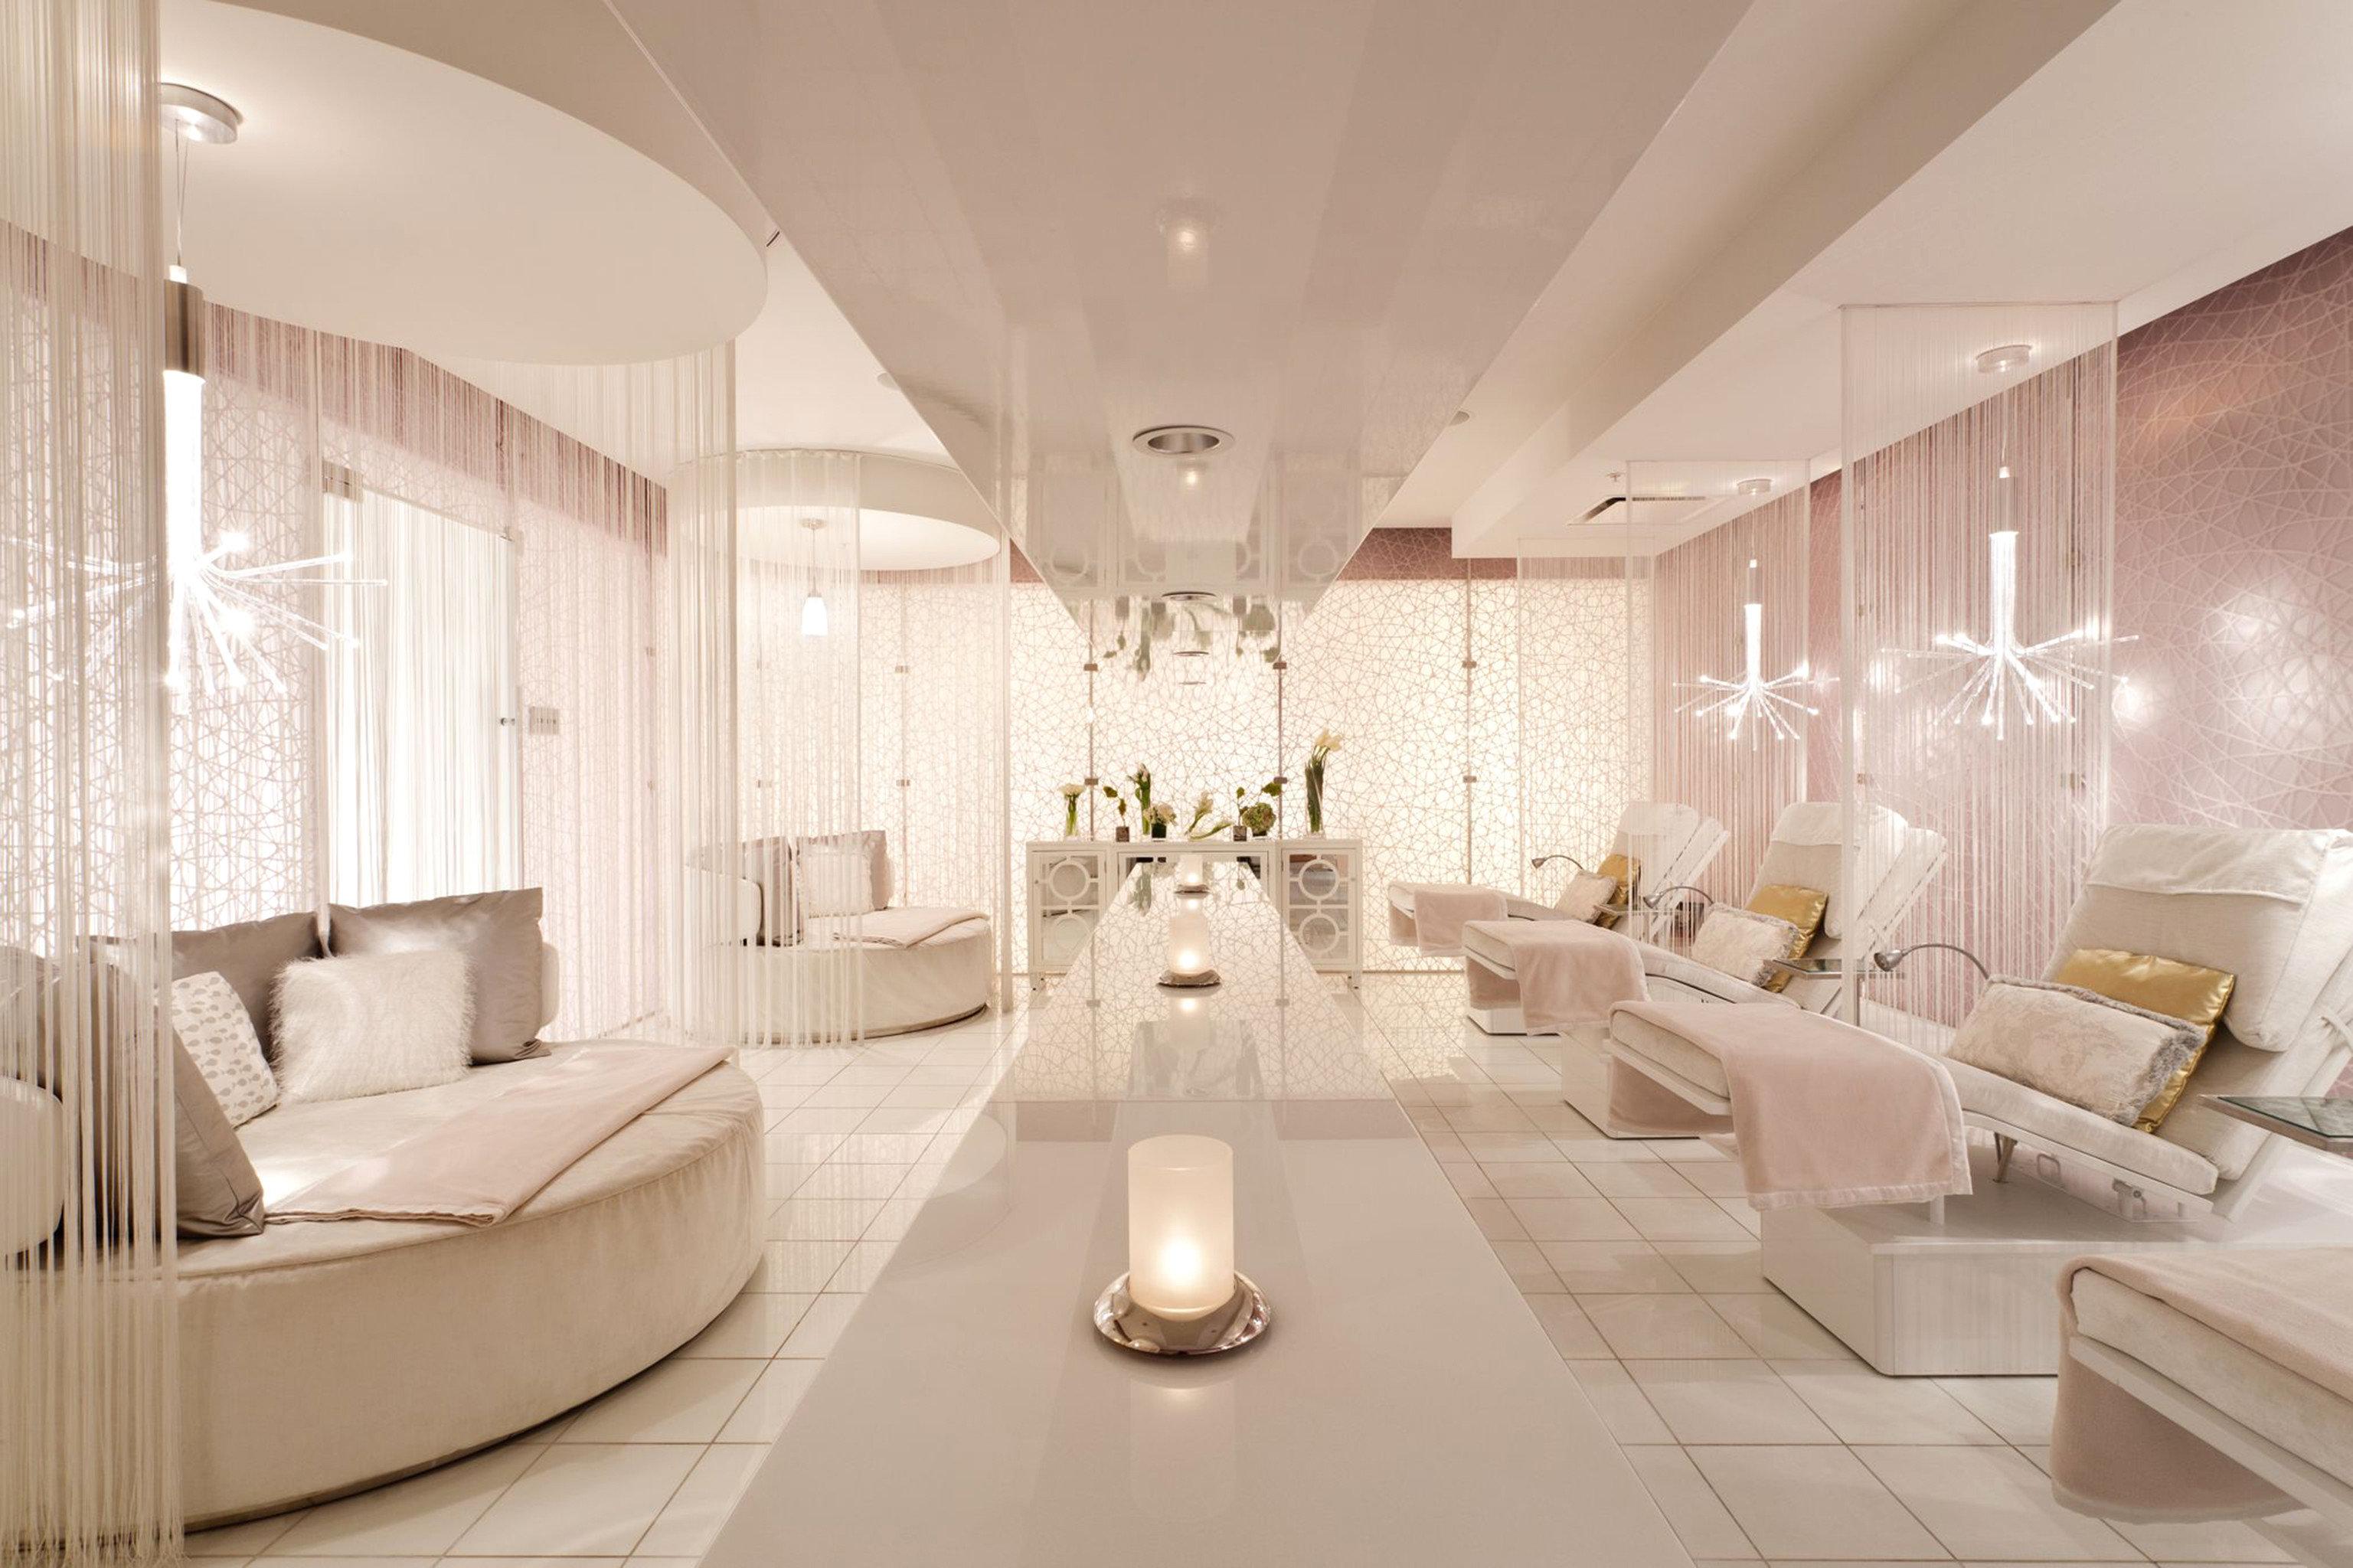 City Elegant Lounge Modern Spa Wellness property Suite lighting Lobby living room mansion function hall bathroom